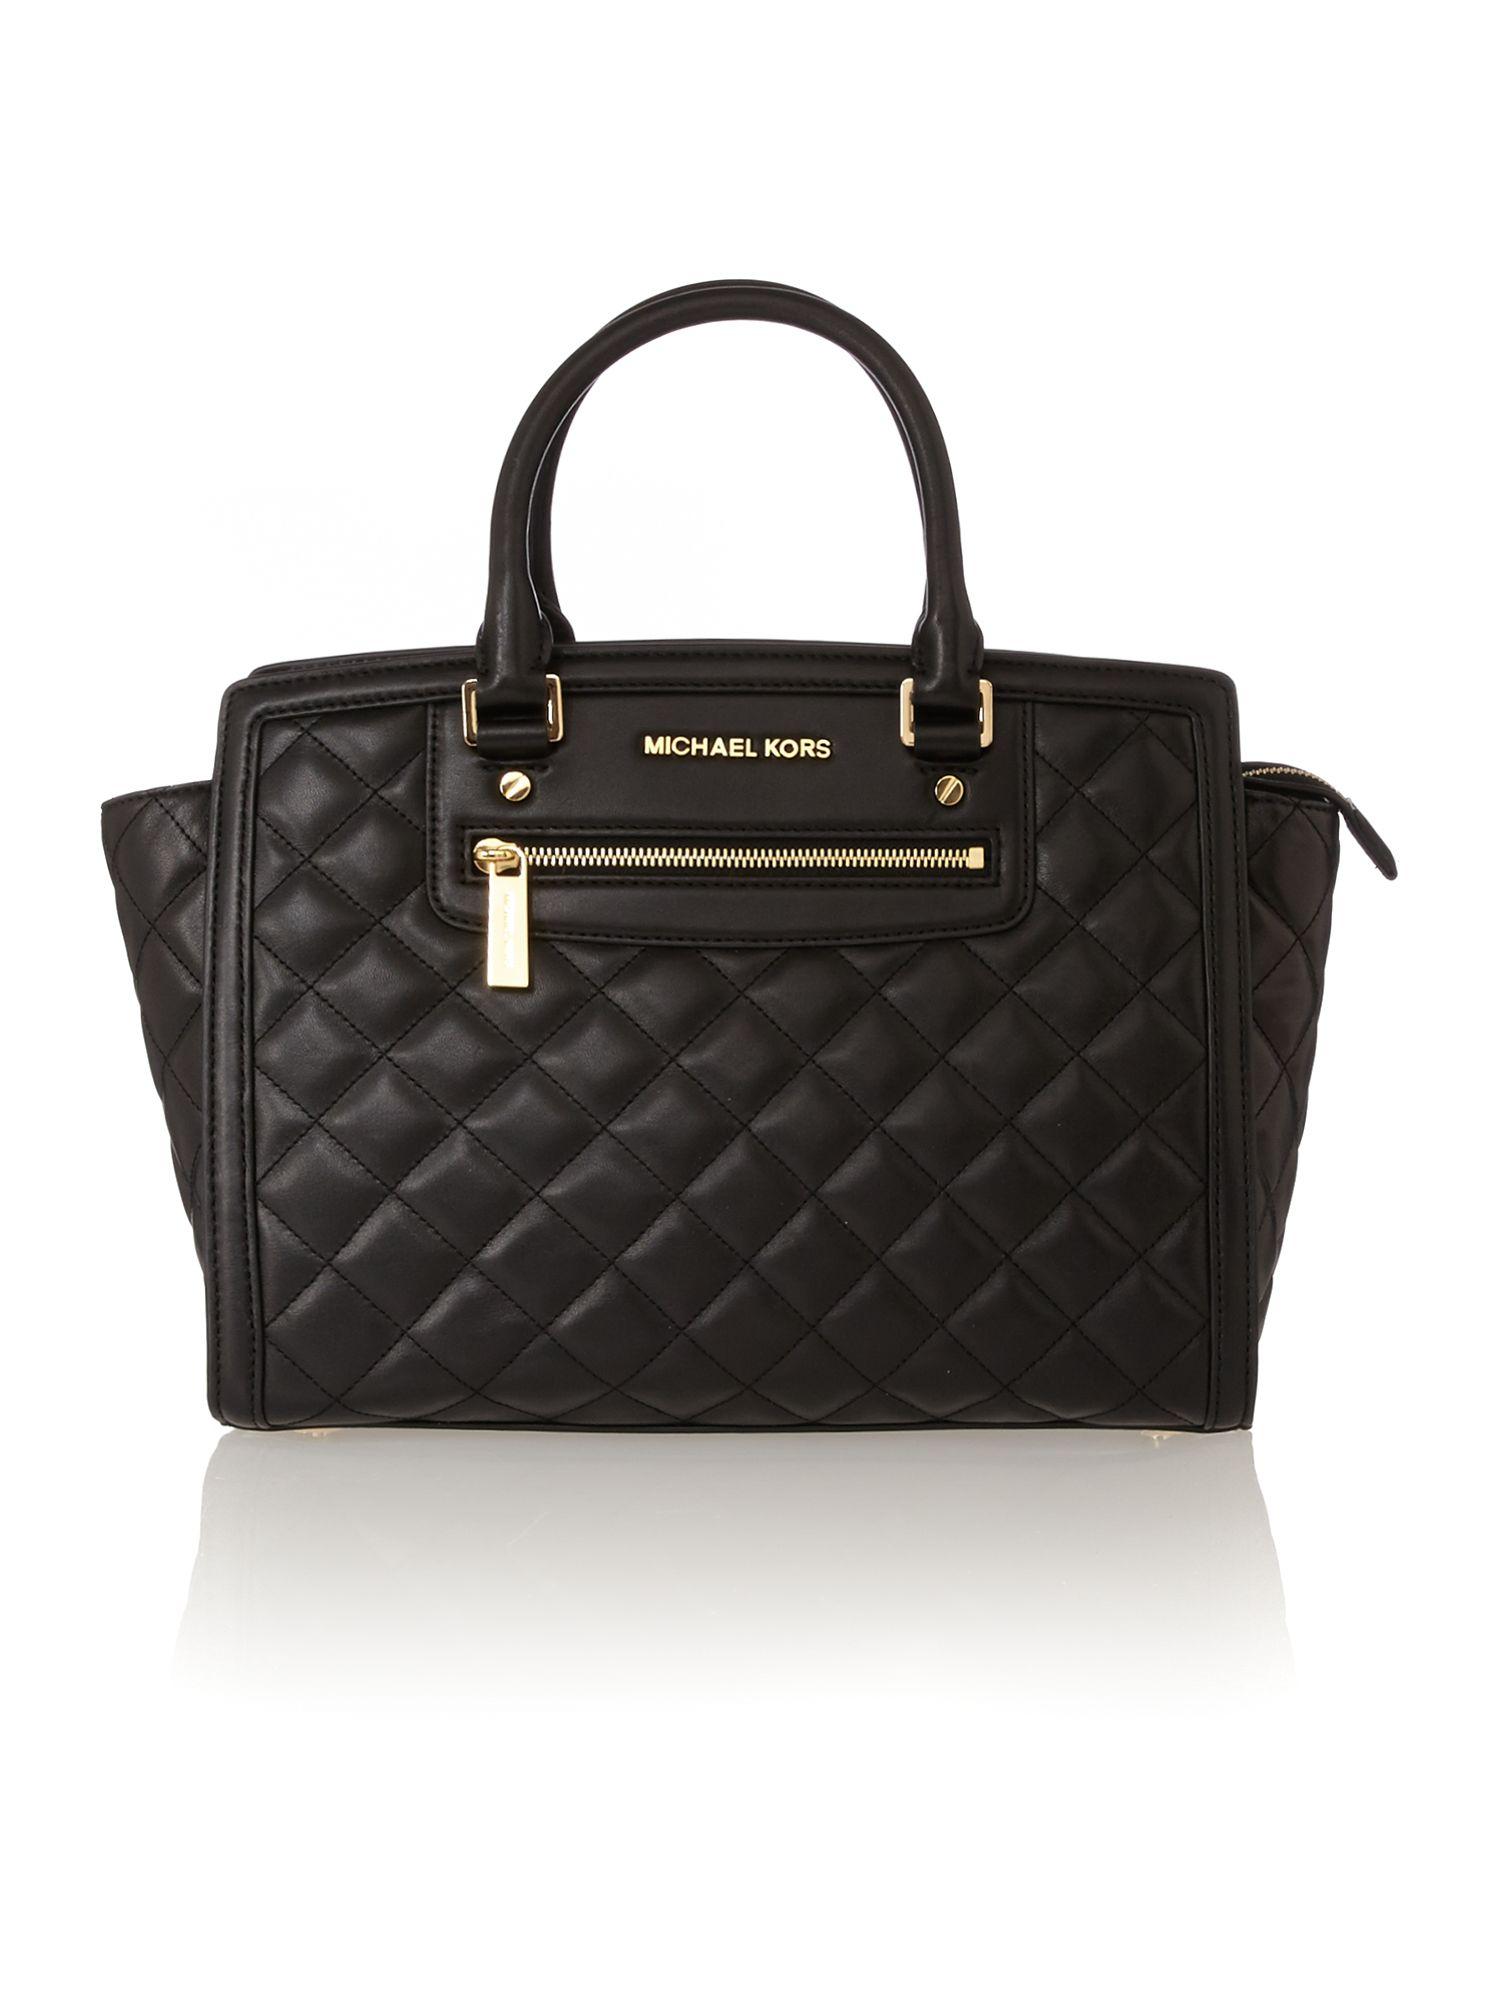 michael kors selma zip quilt black large tote bag in black lyst. Black Bedroom Furniture Sets. Home Design Ideas